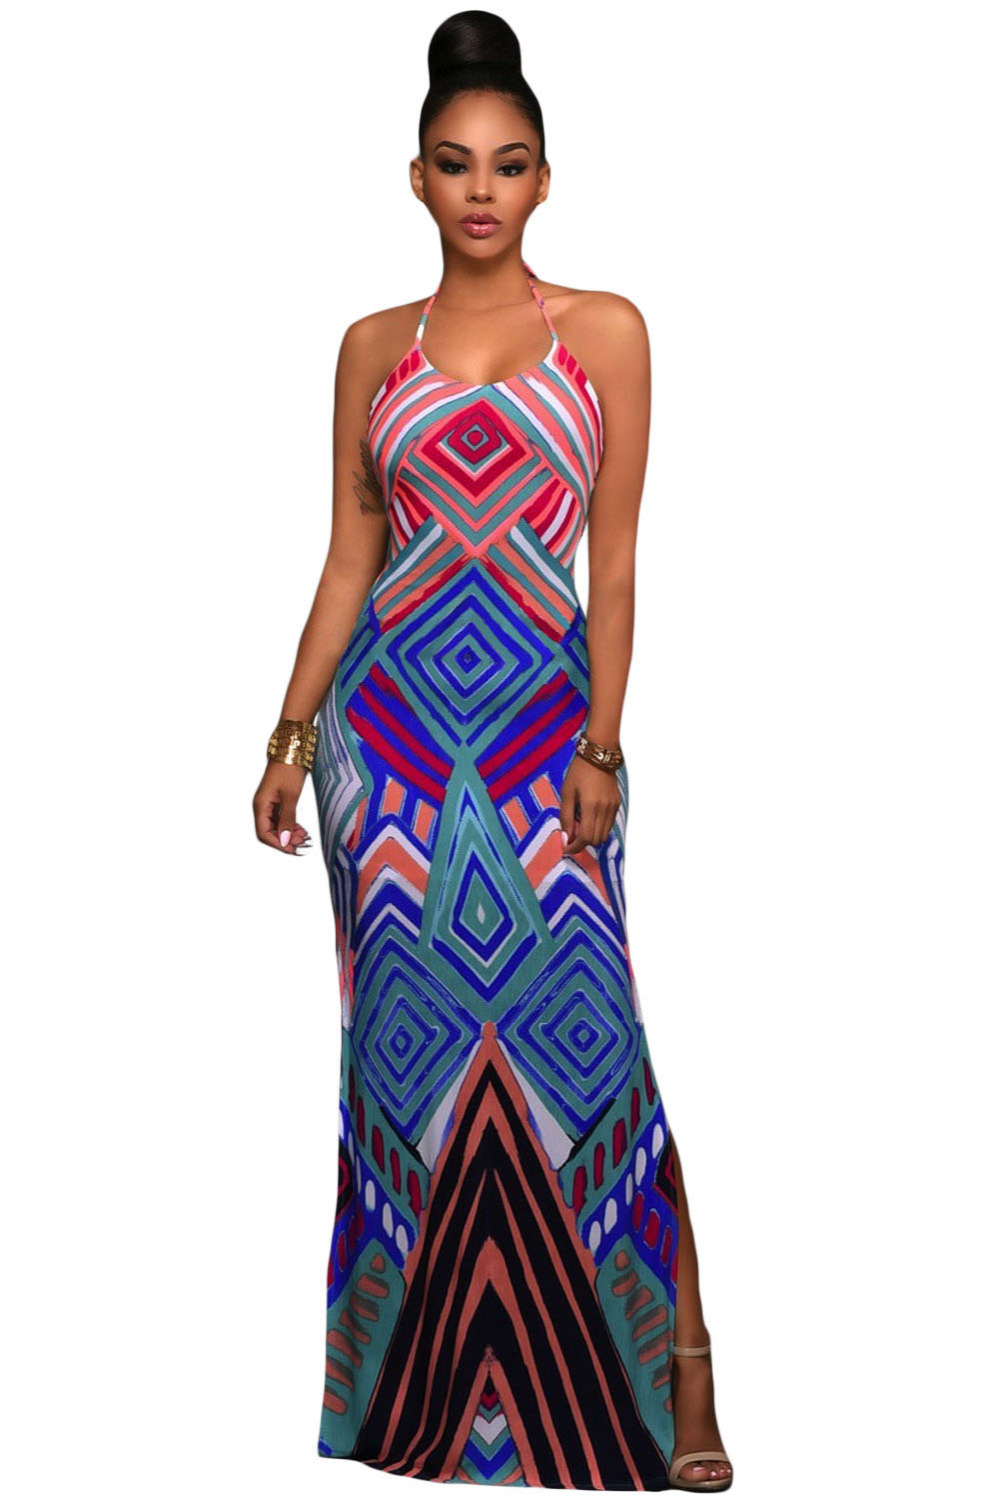 Chic Geometric Pattern Boho Style Maxi Dress with Slit ...